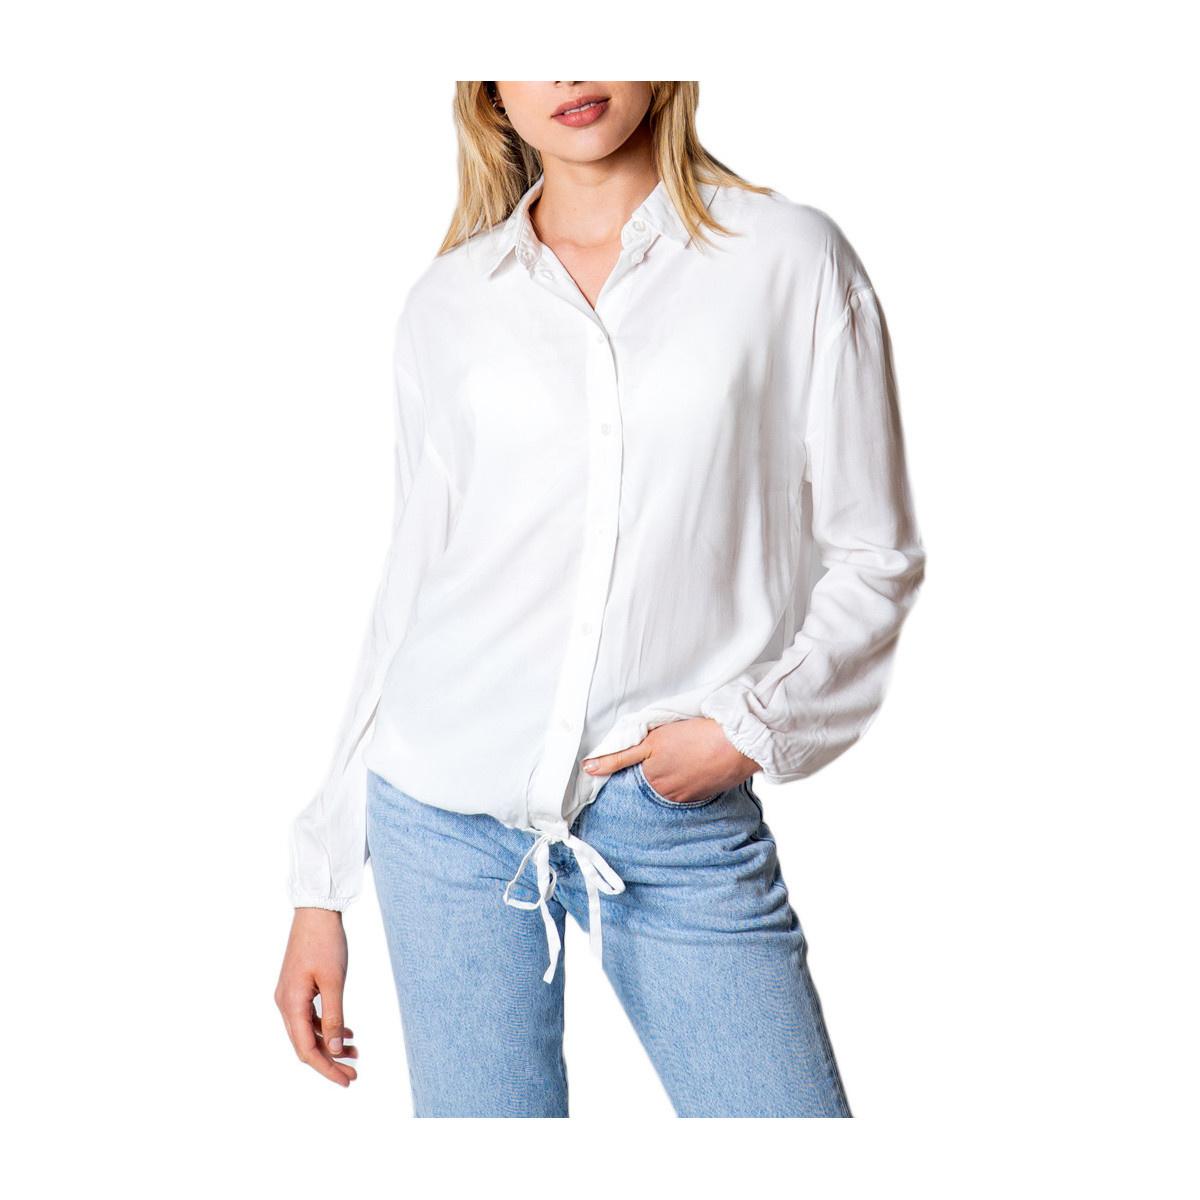 PEPITES only chemise alisa-5